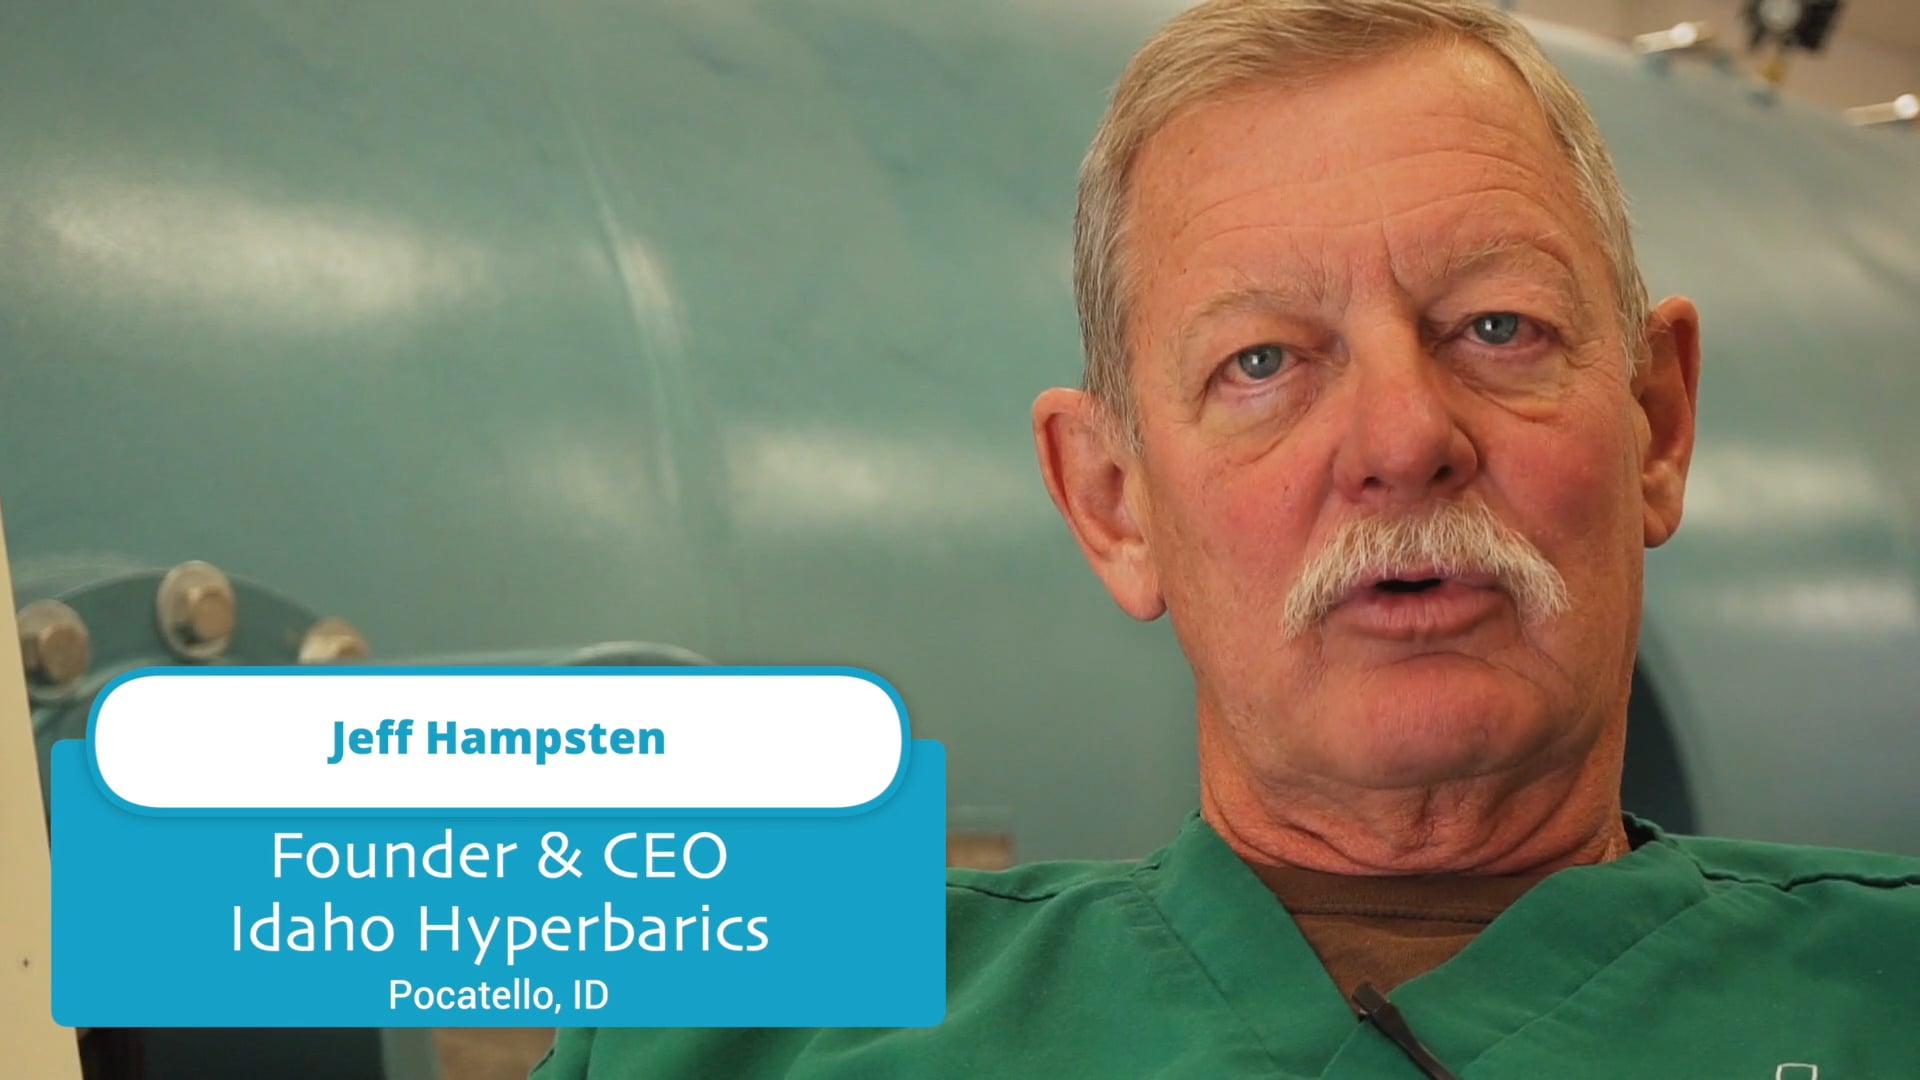 Welcome to Idaho Hyperbarics